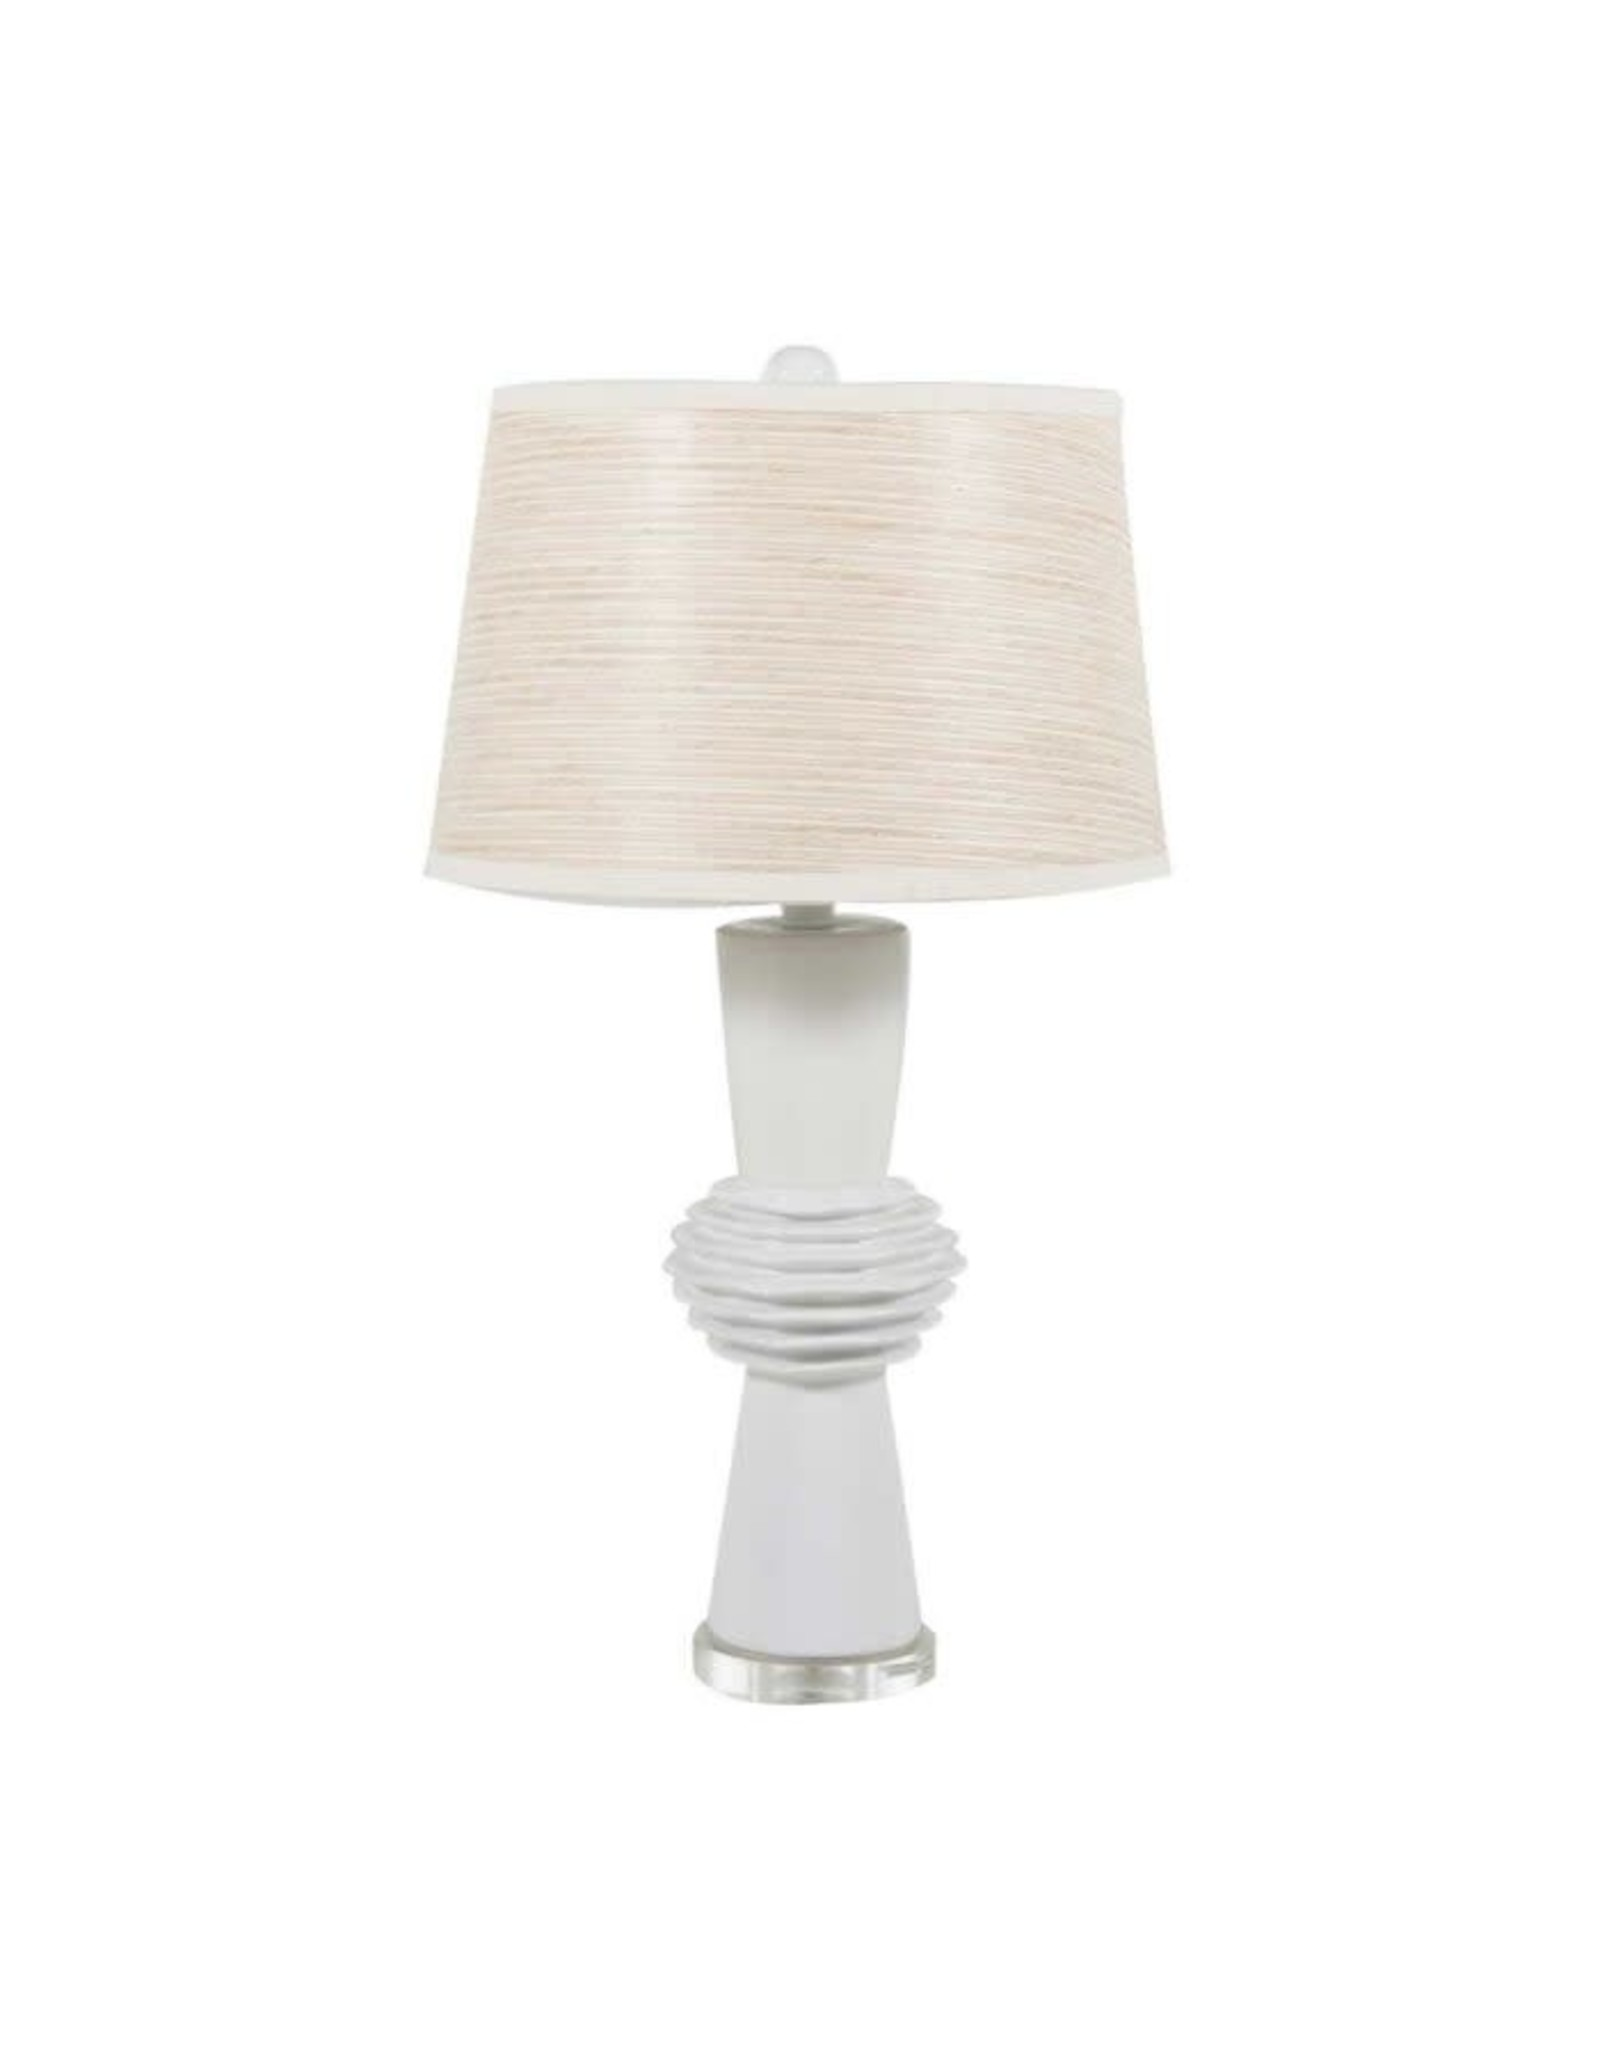 Website Adelaide Table Lamp